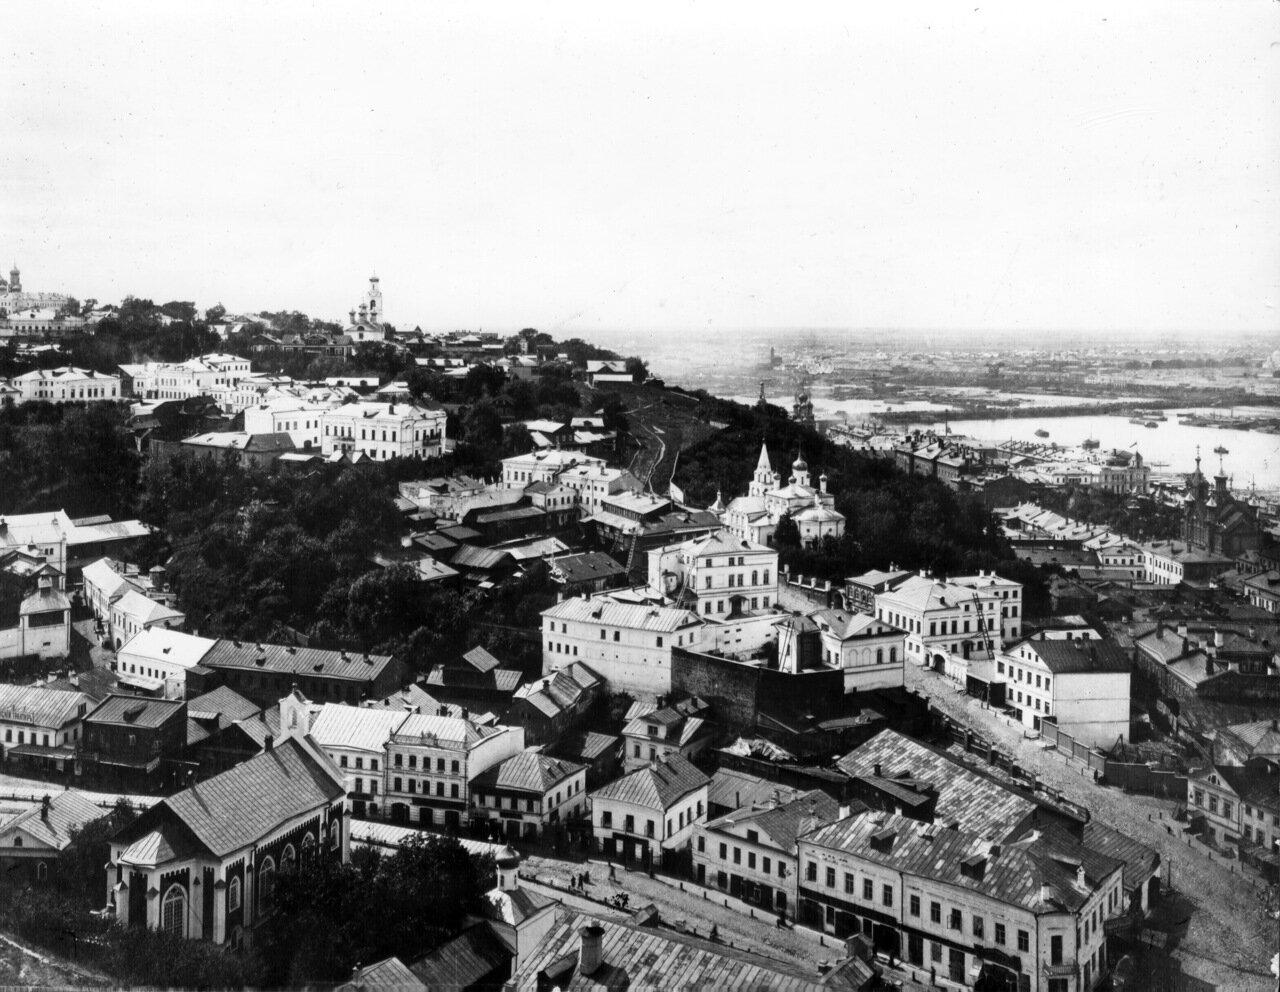 Ильинская улица и Зеленский съезд